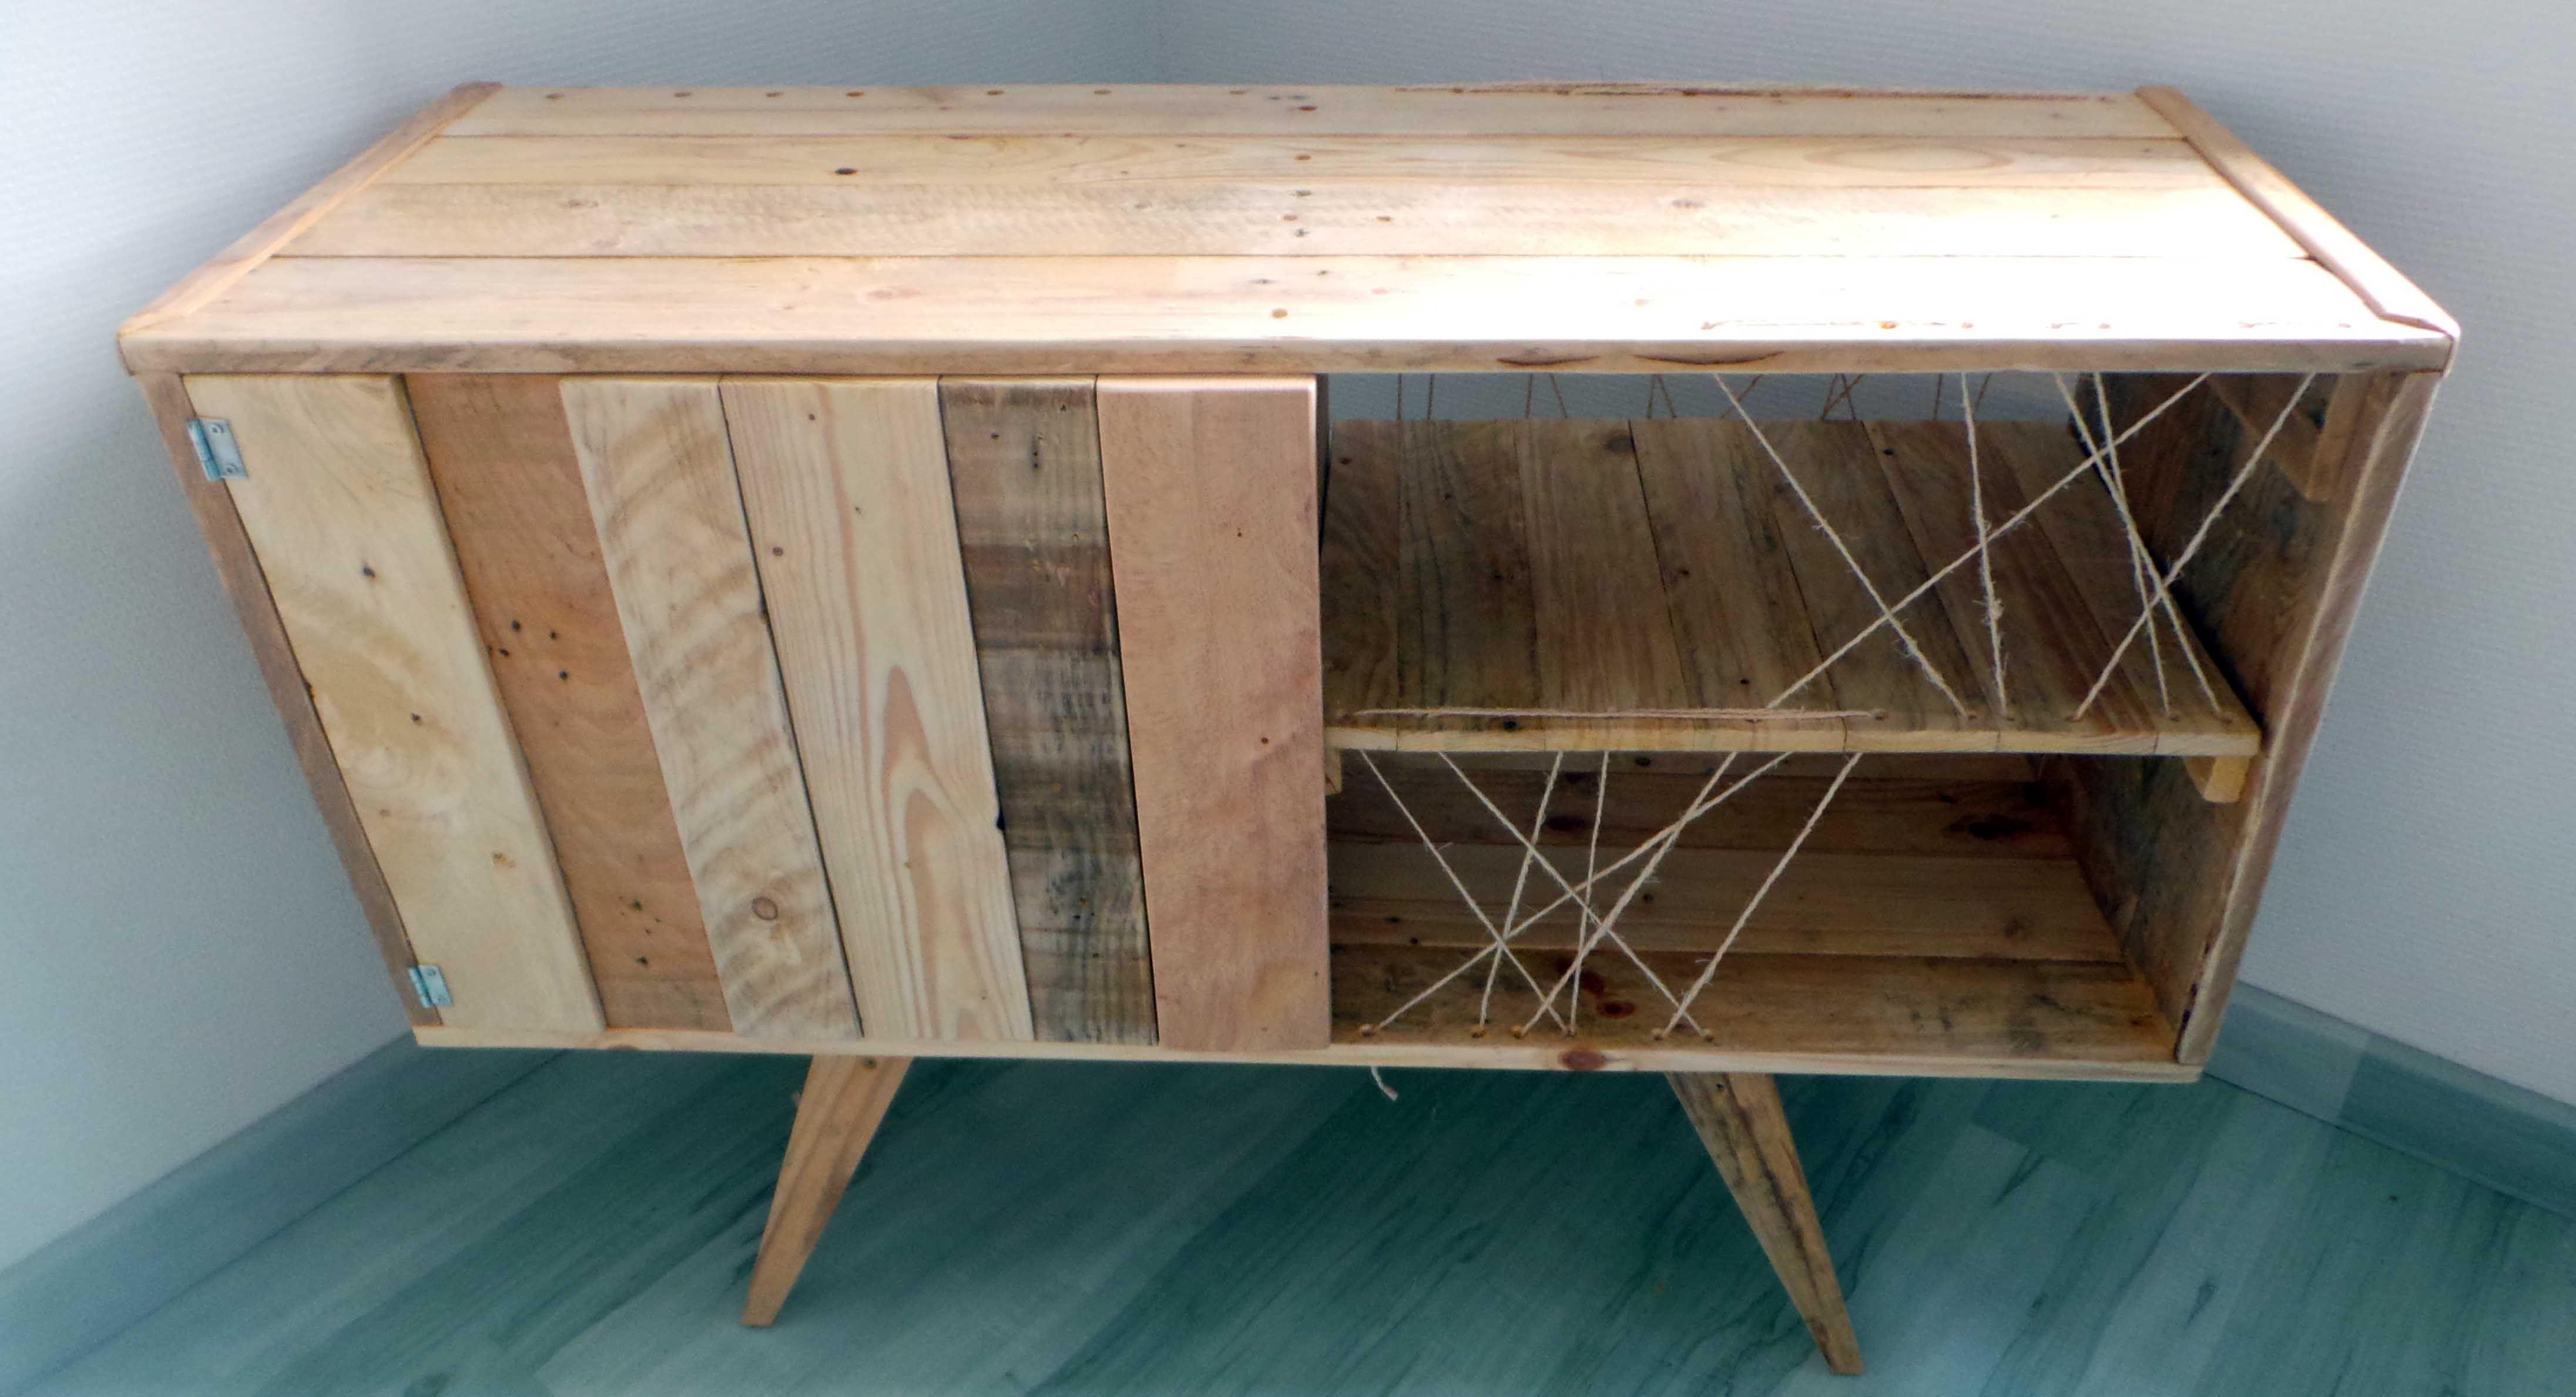 f7698a36b1a94af88ef0423967c4d92f Luxe De Table Basse Palette Verre Concept